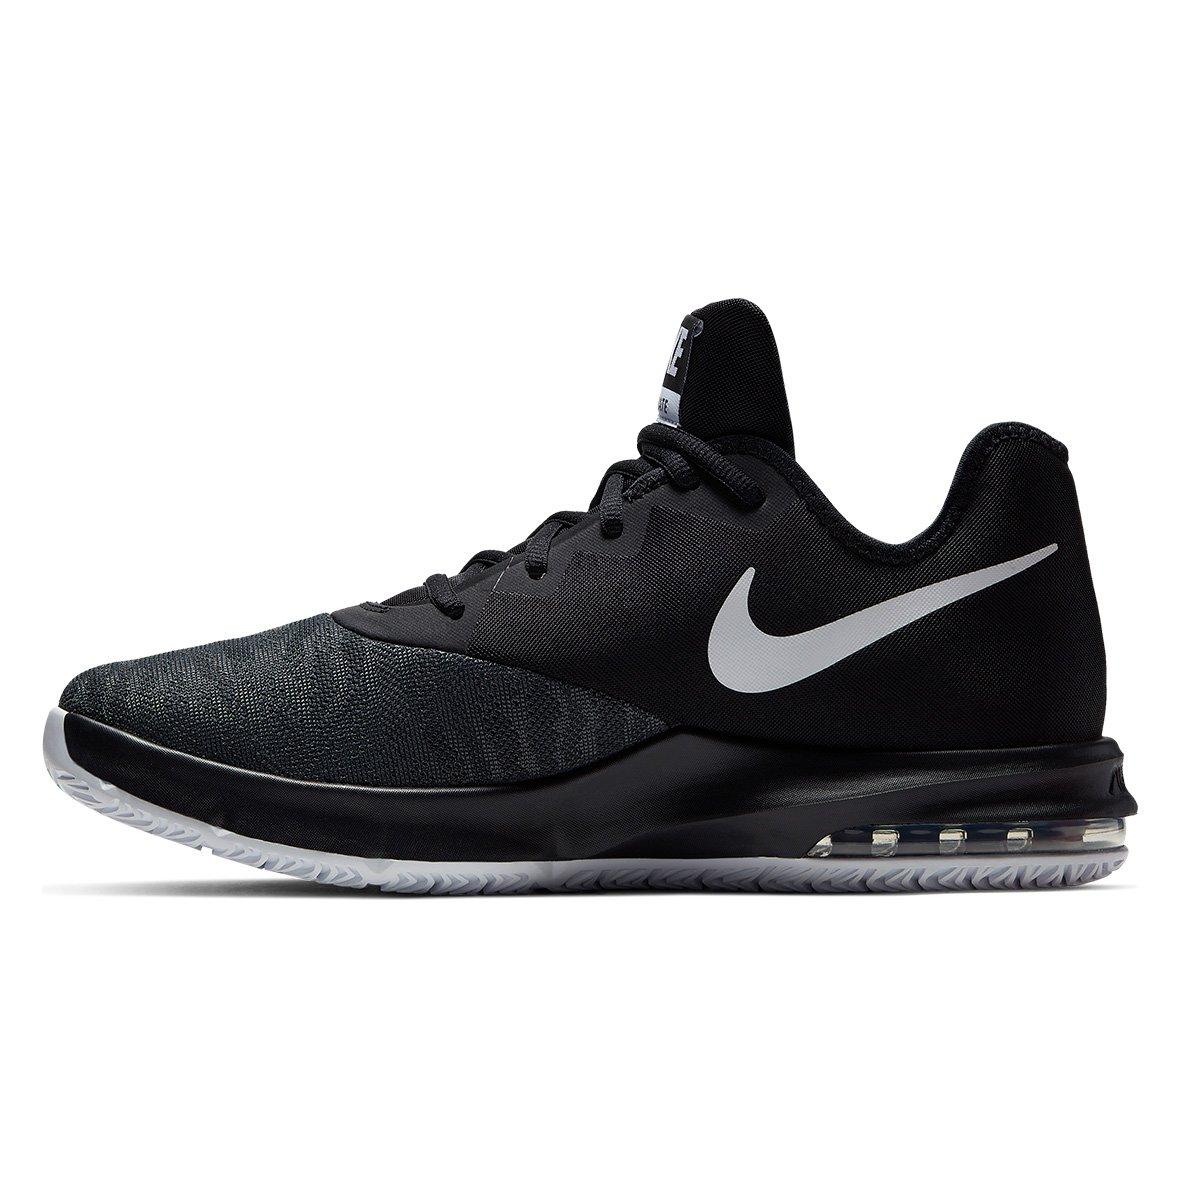 a7ba5cf45b531 Tênis Nike Air Max Infuriate III Low Masculino - Tam: 44 - Shopping ...